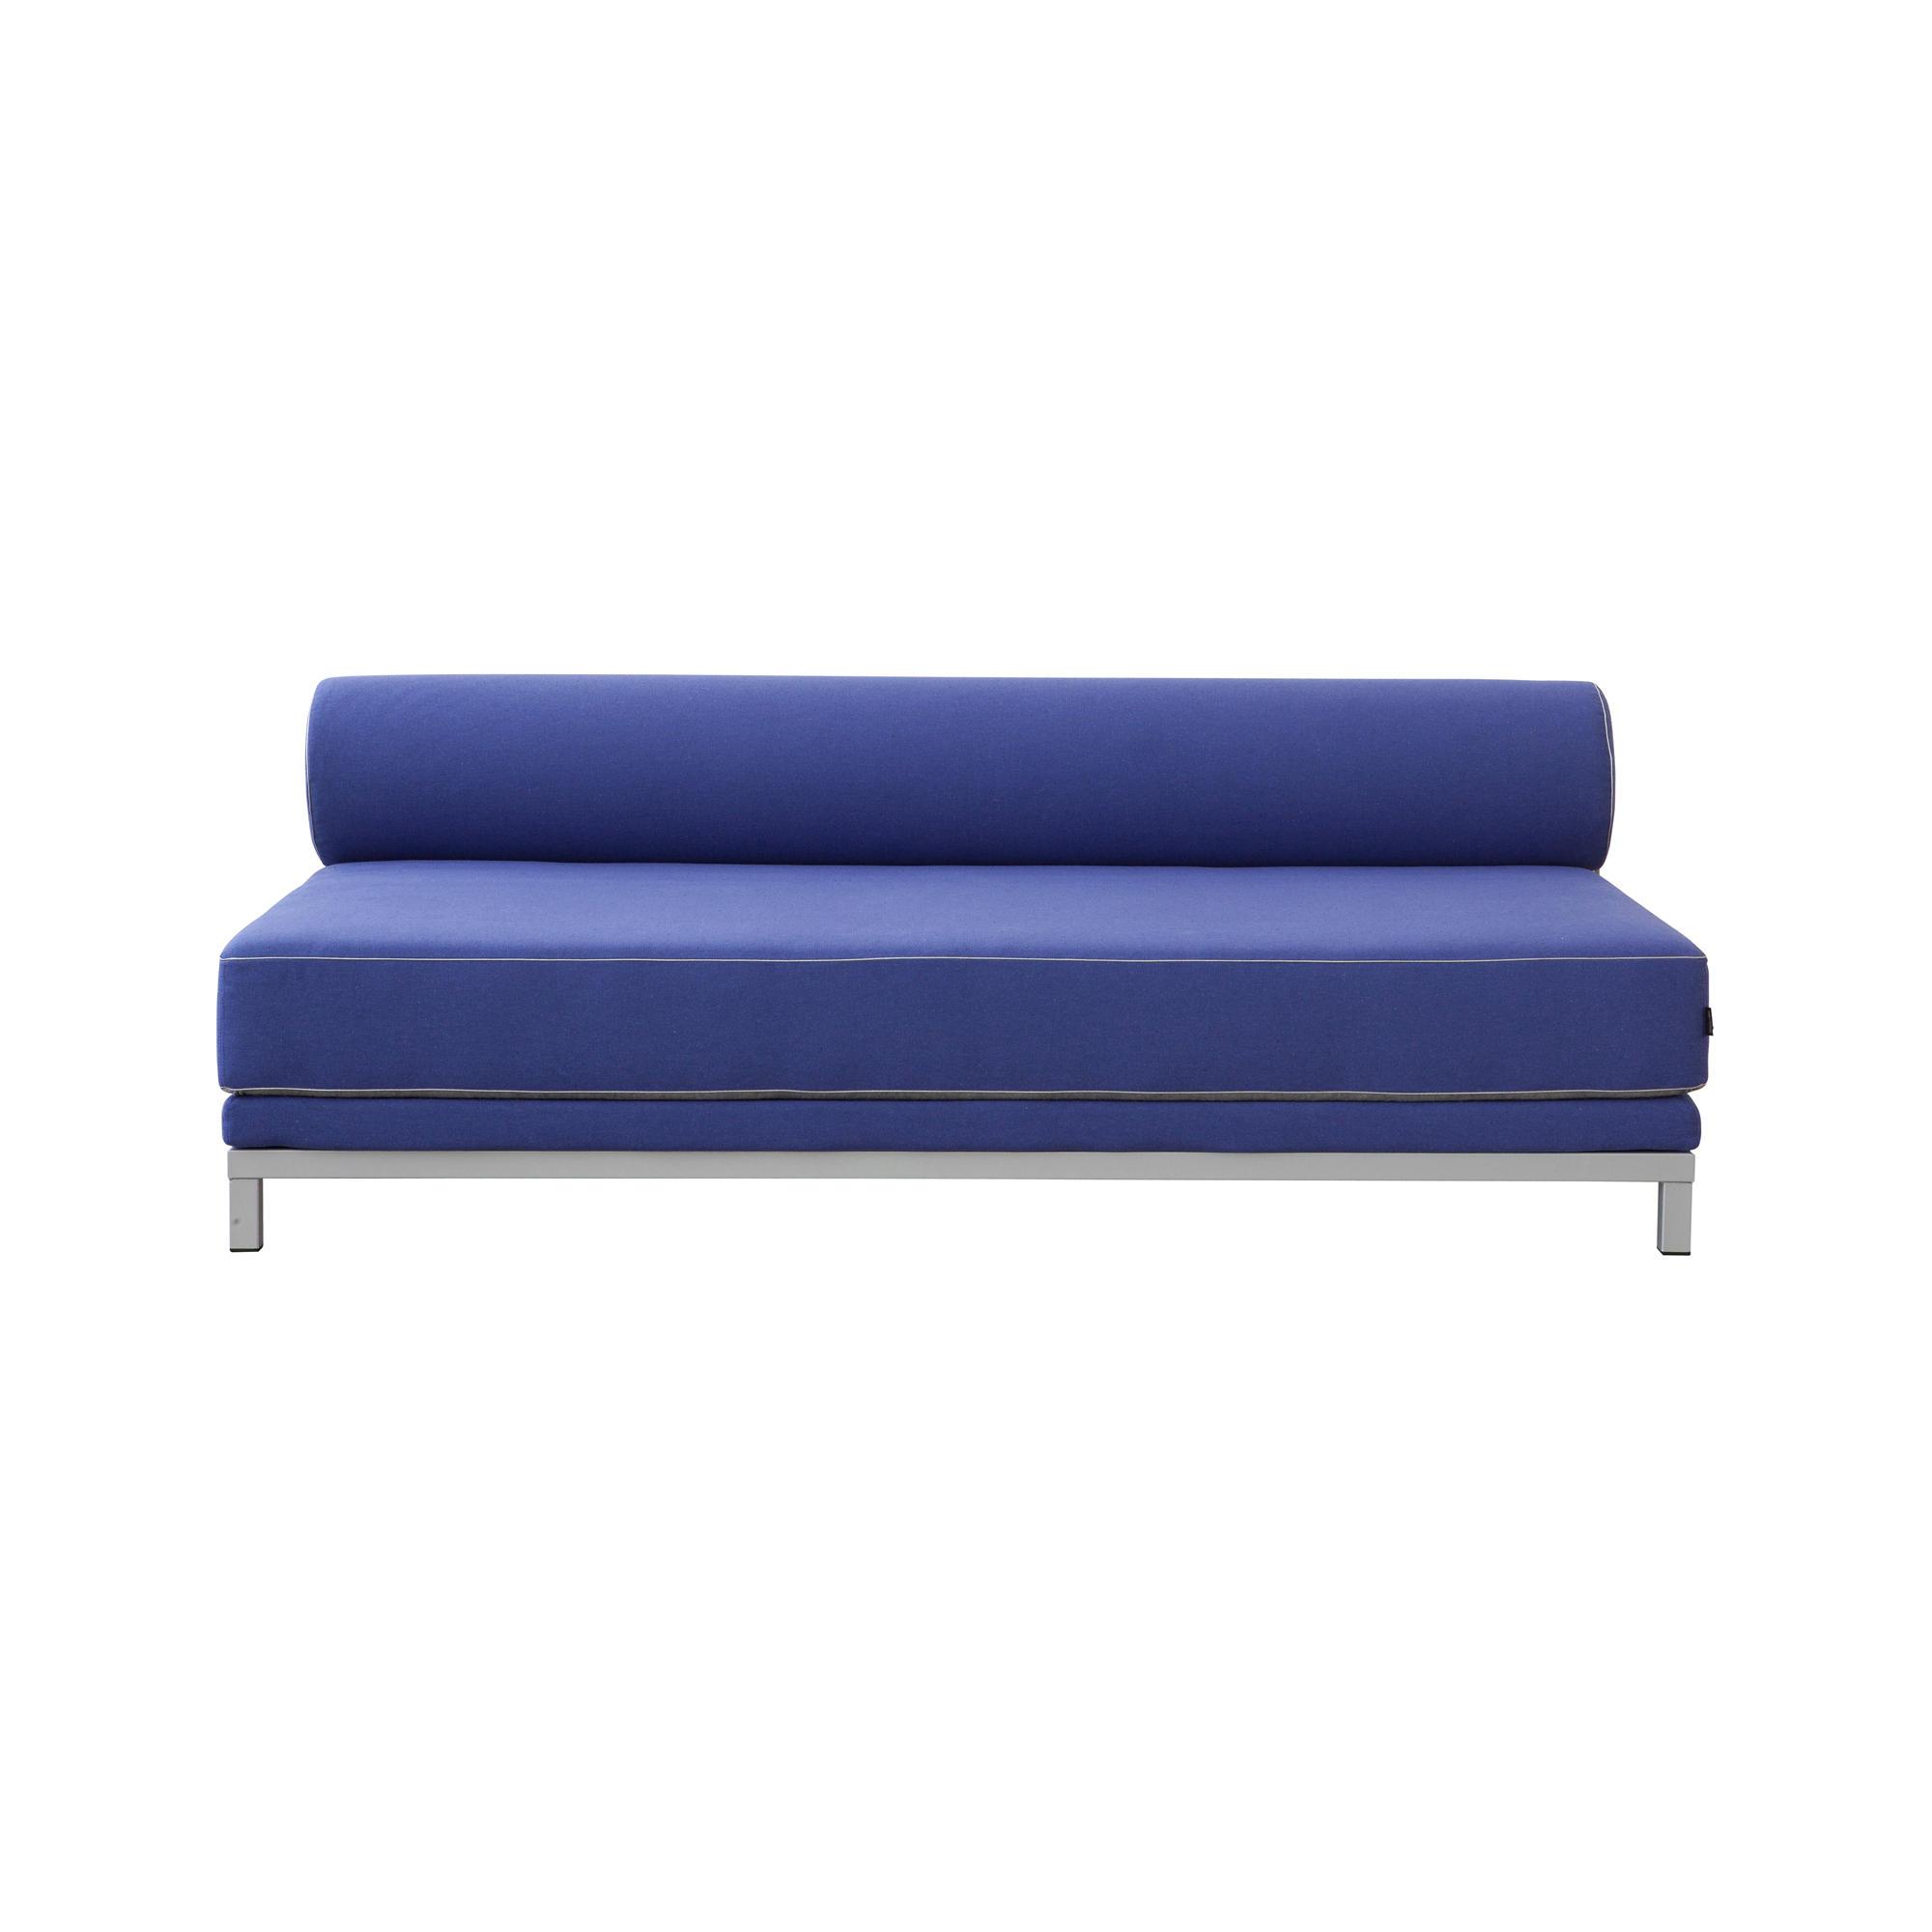 SLEEP Sofa beds from Softline A S